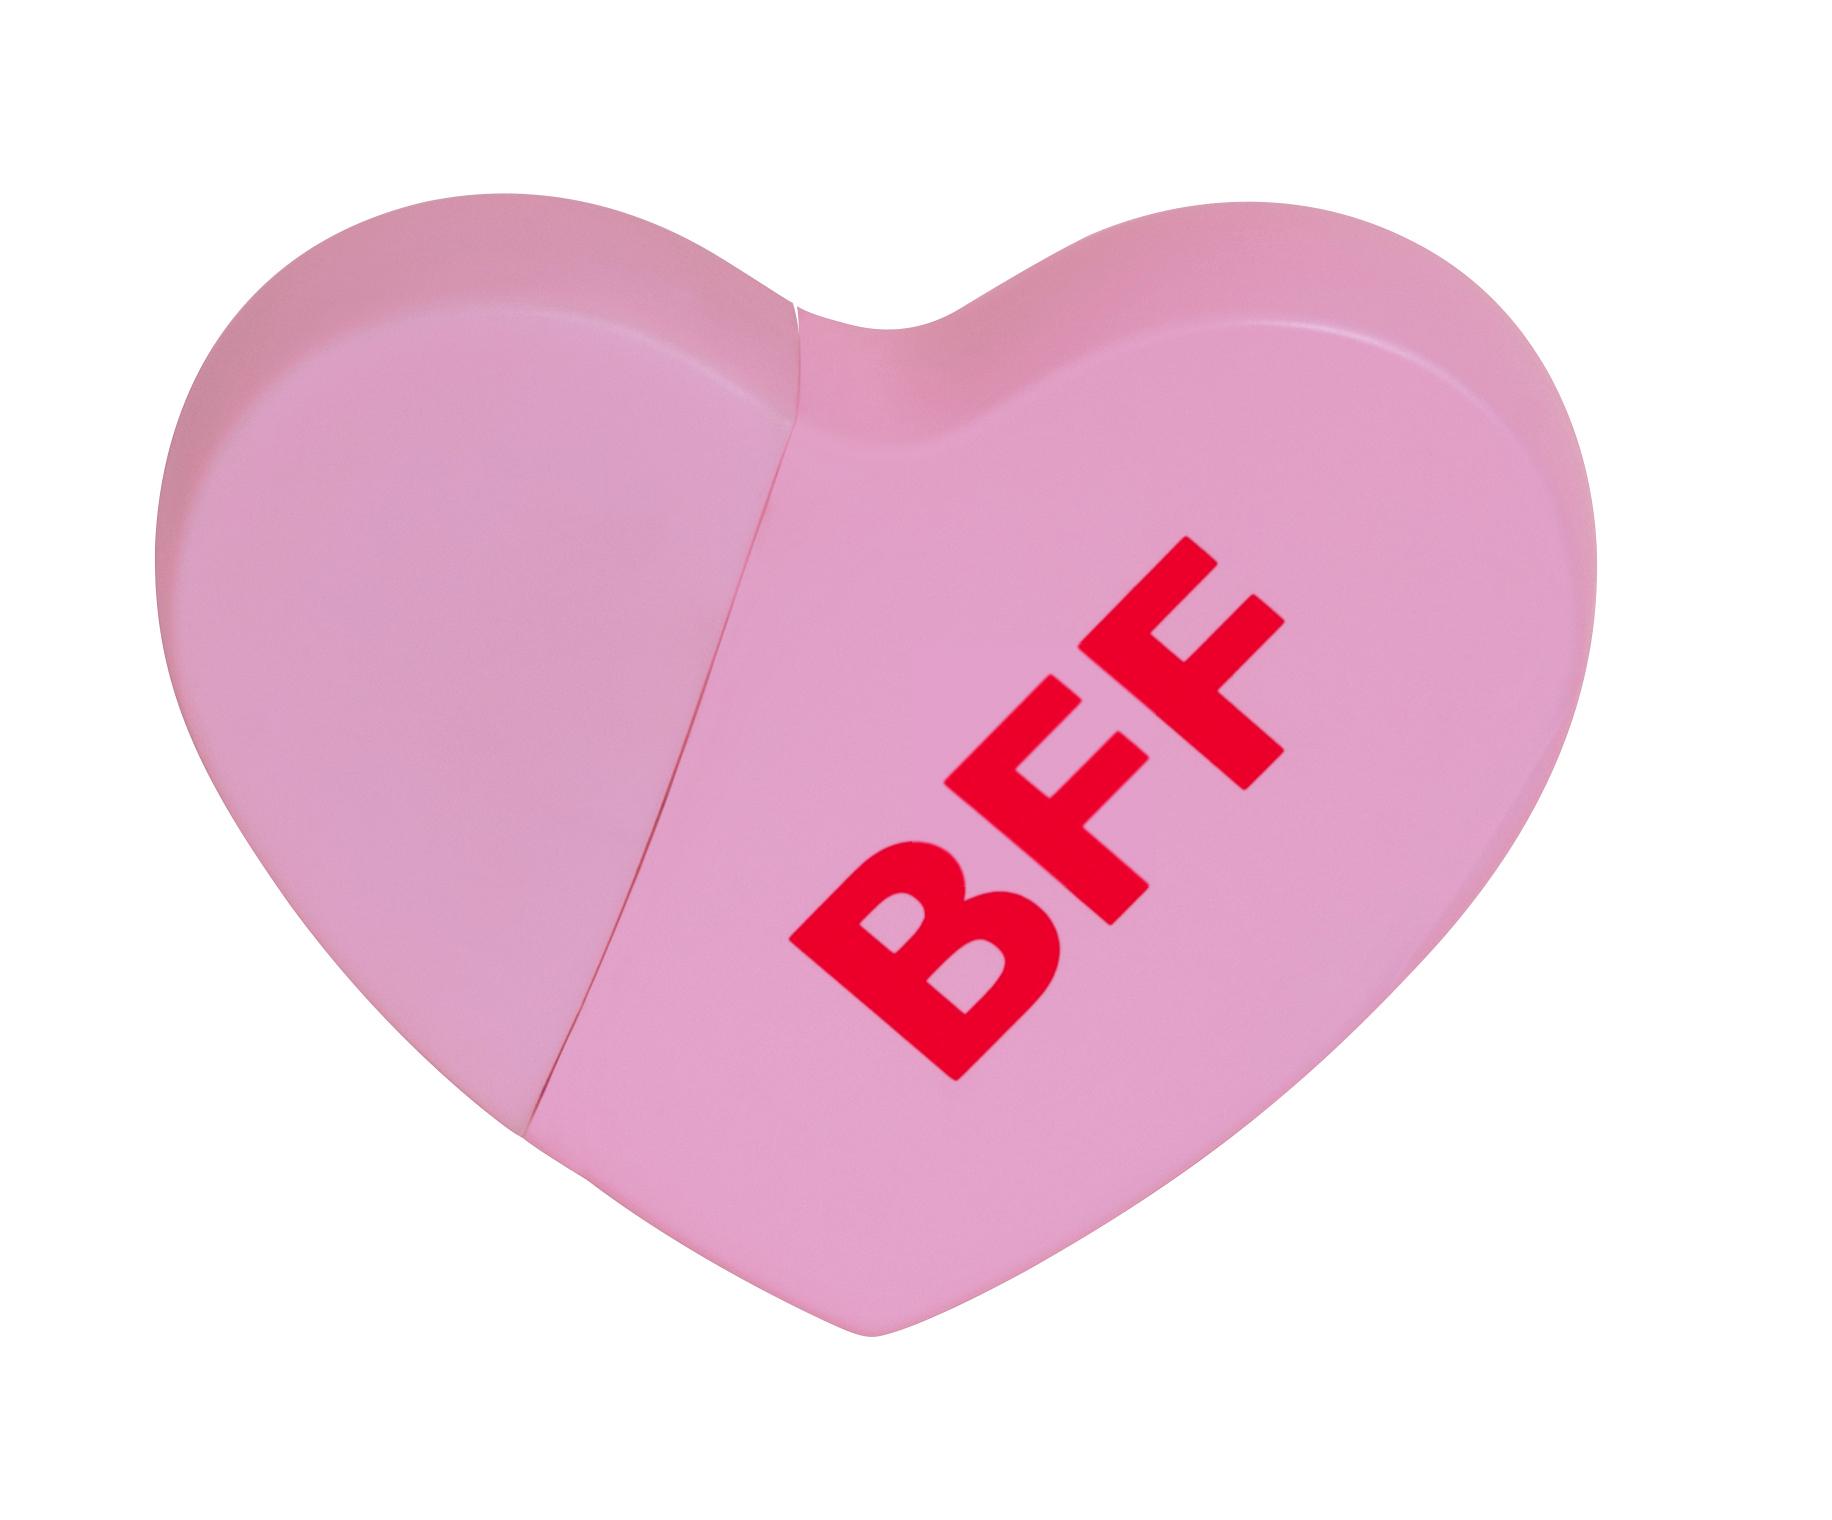 KKW Beauty Kimoji Heart BFF Fragrances